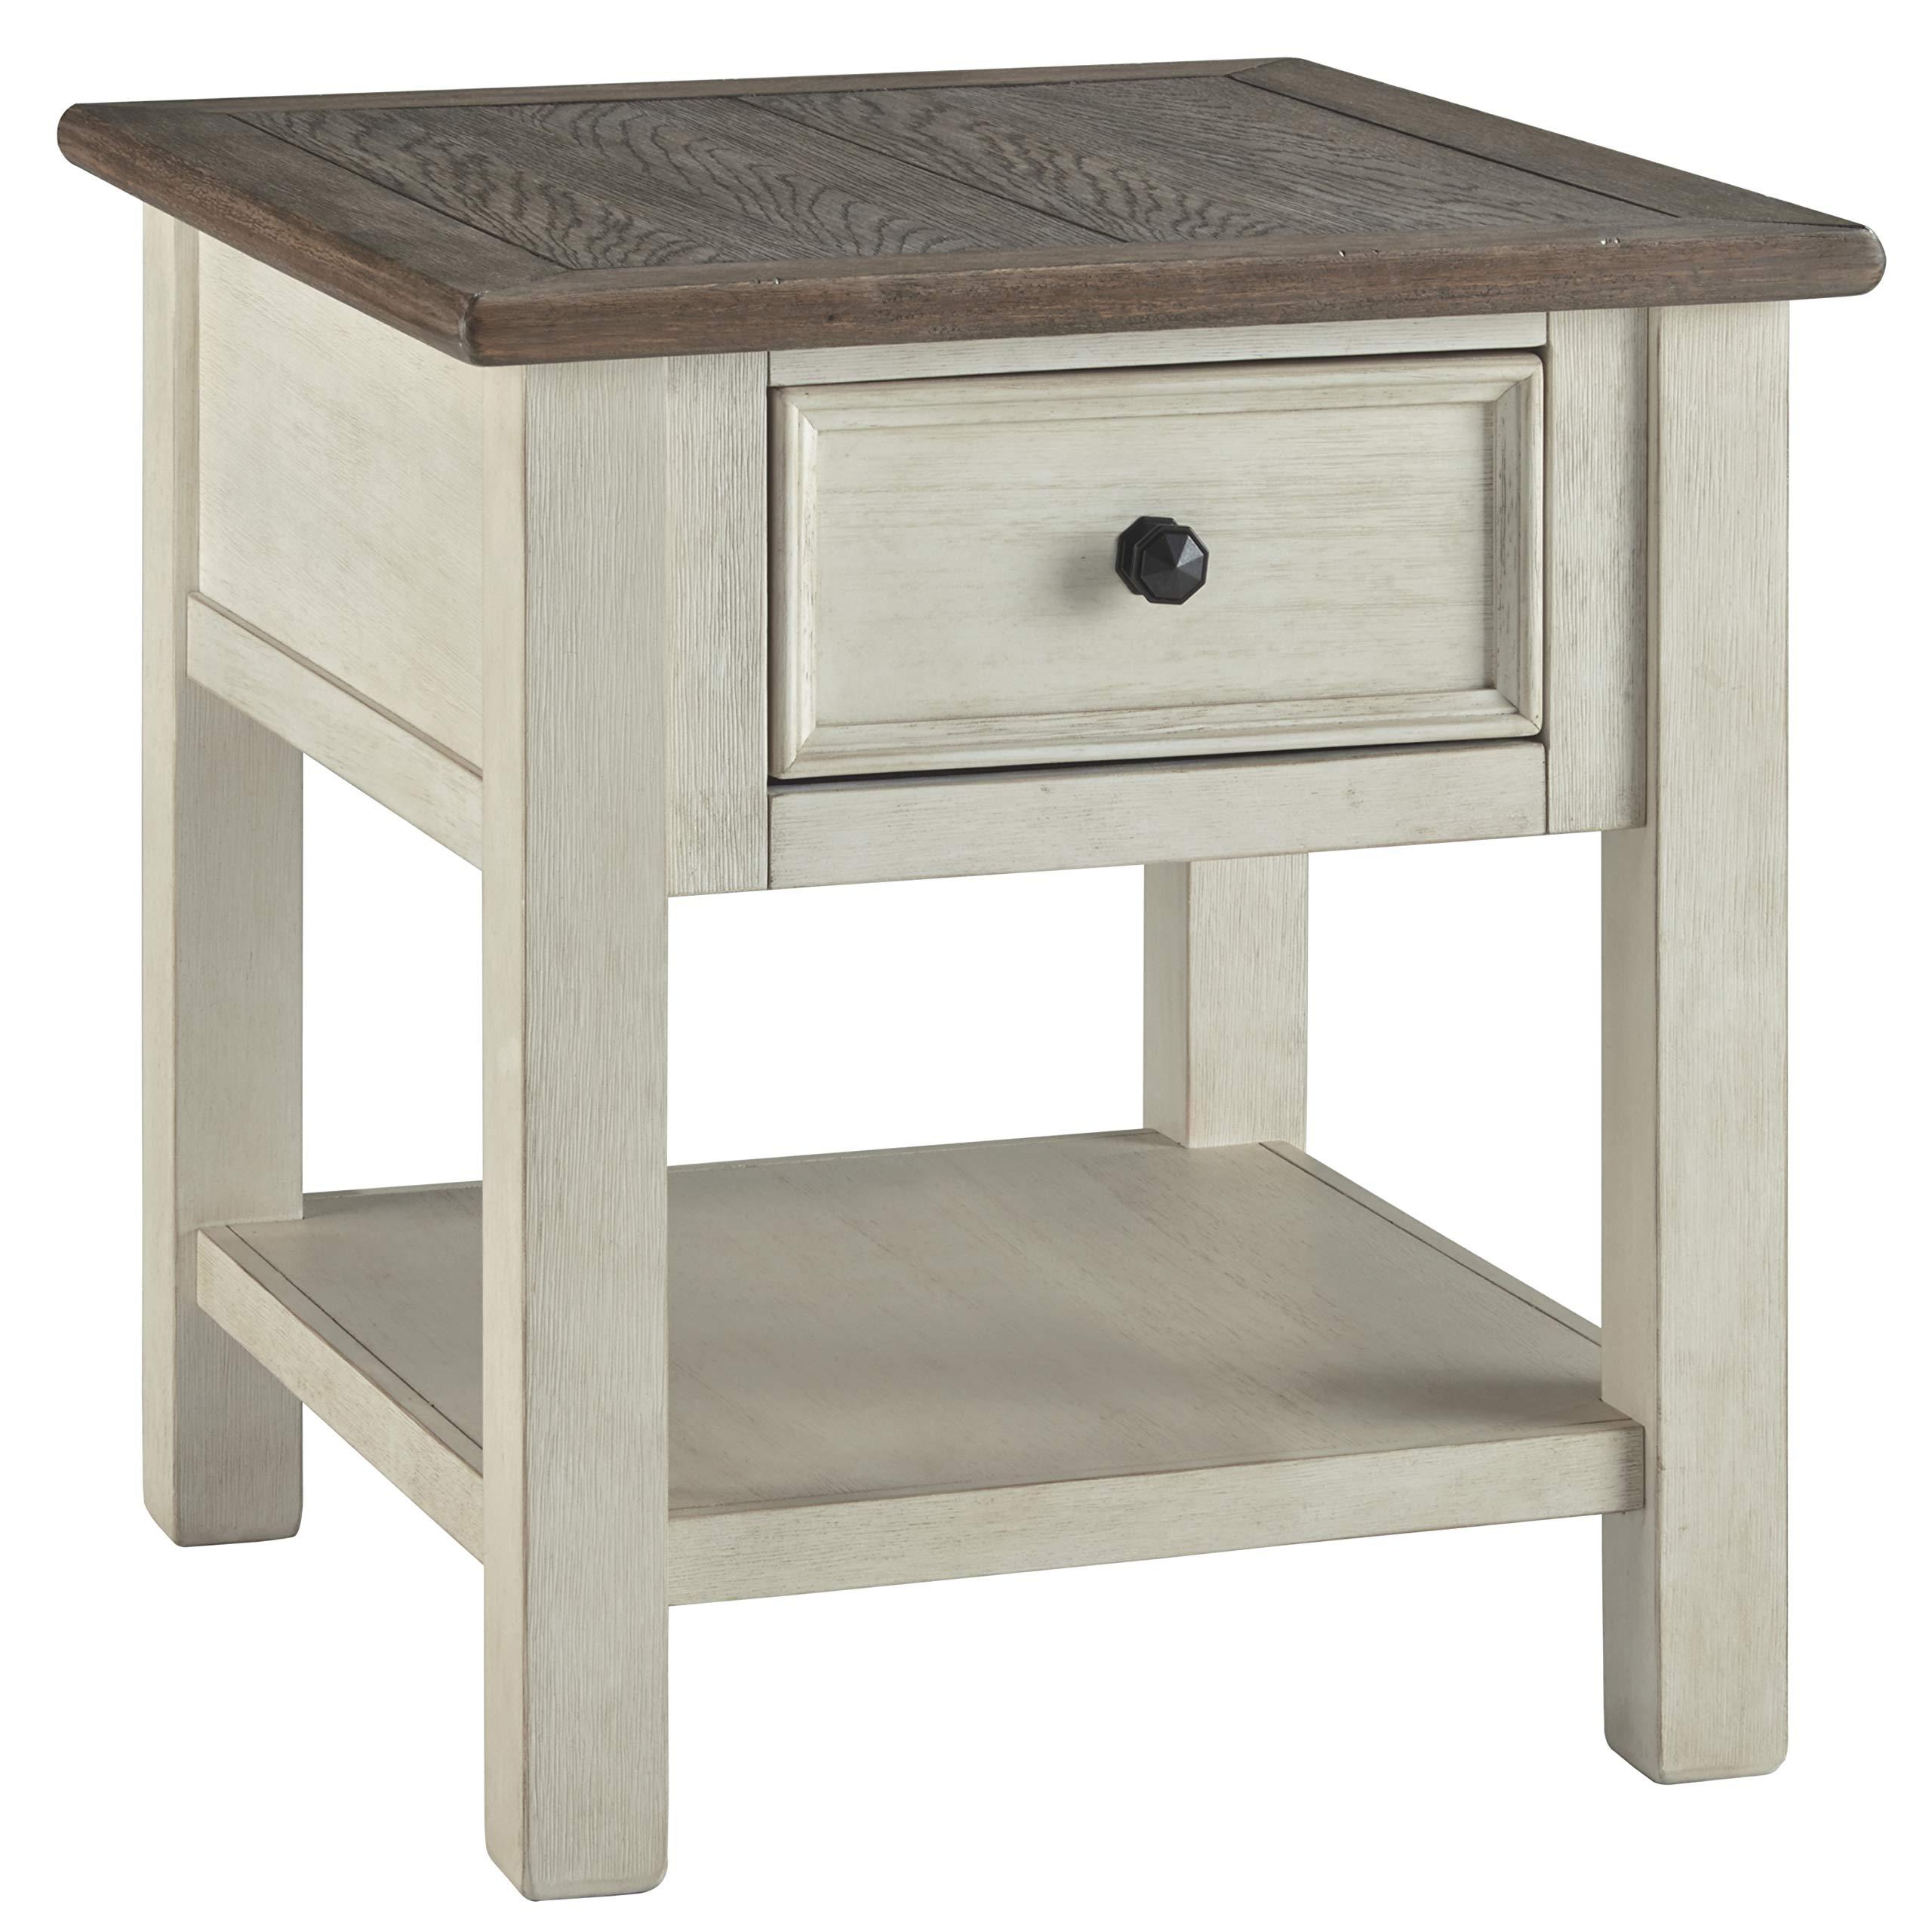 Ashley Furniture Signature Design - Bolanburg Rectangularside Table, Two-Tone by Signature Design by Ashley